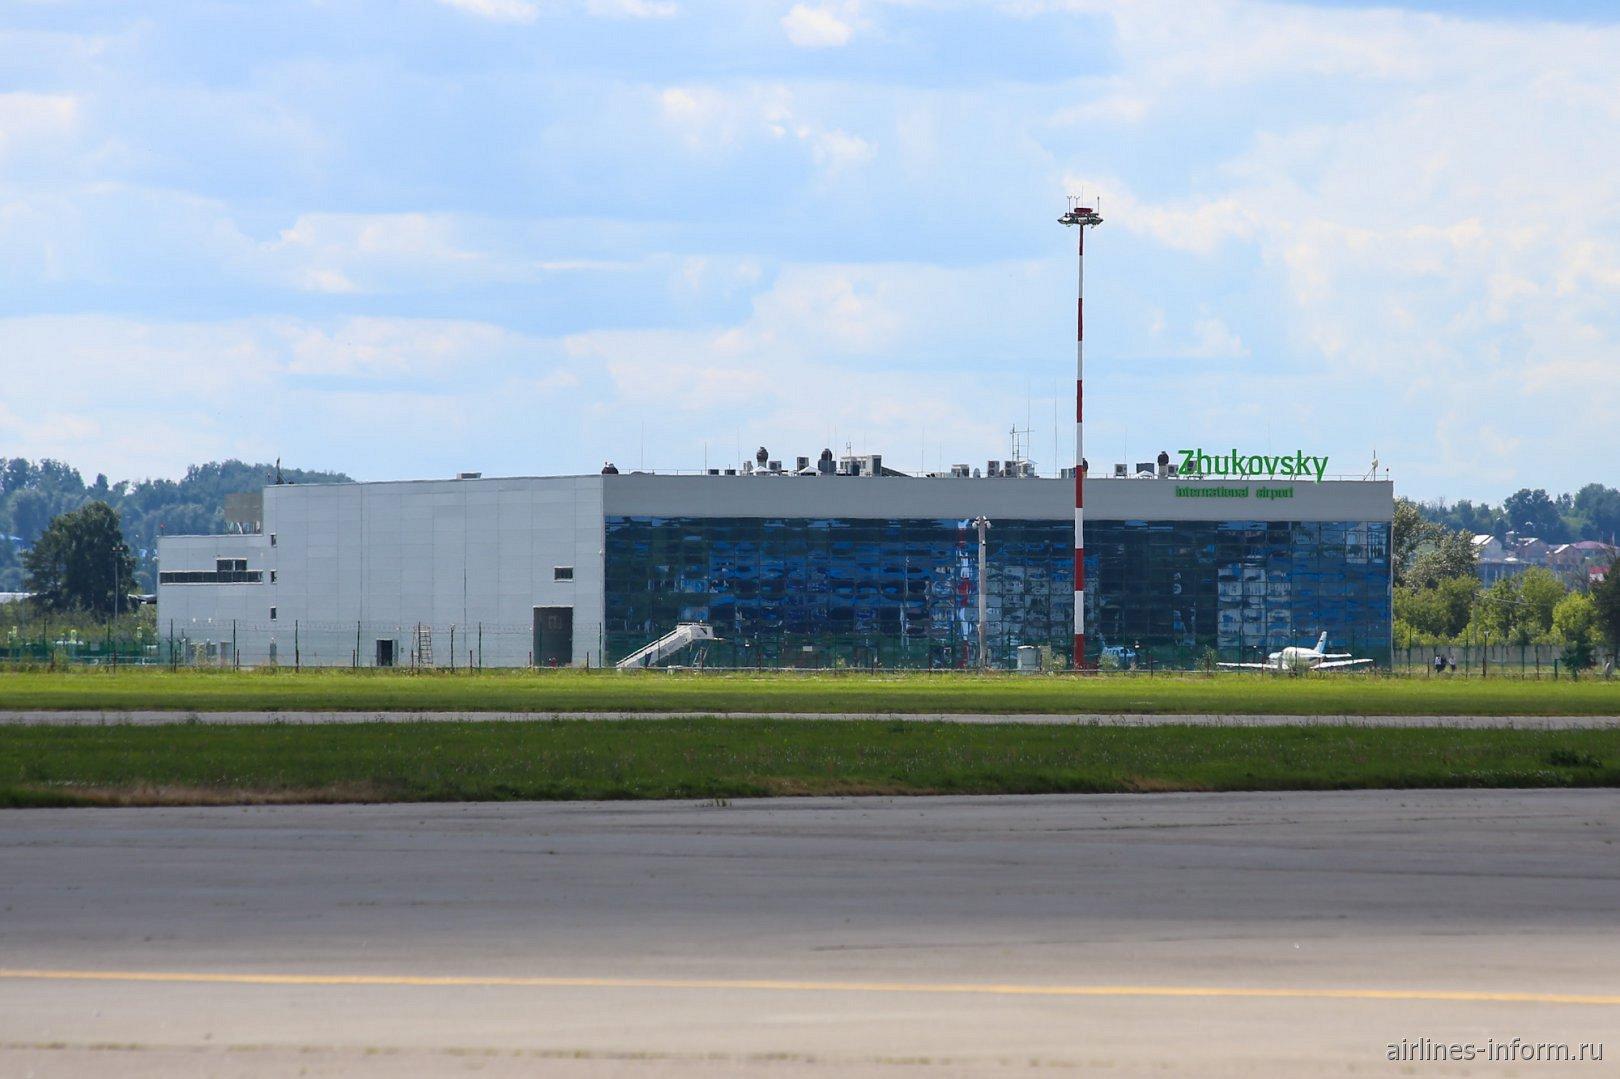 Вид с перрона на аэровокзал аэропорта Жуковский